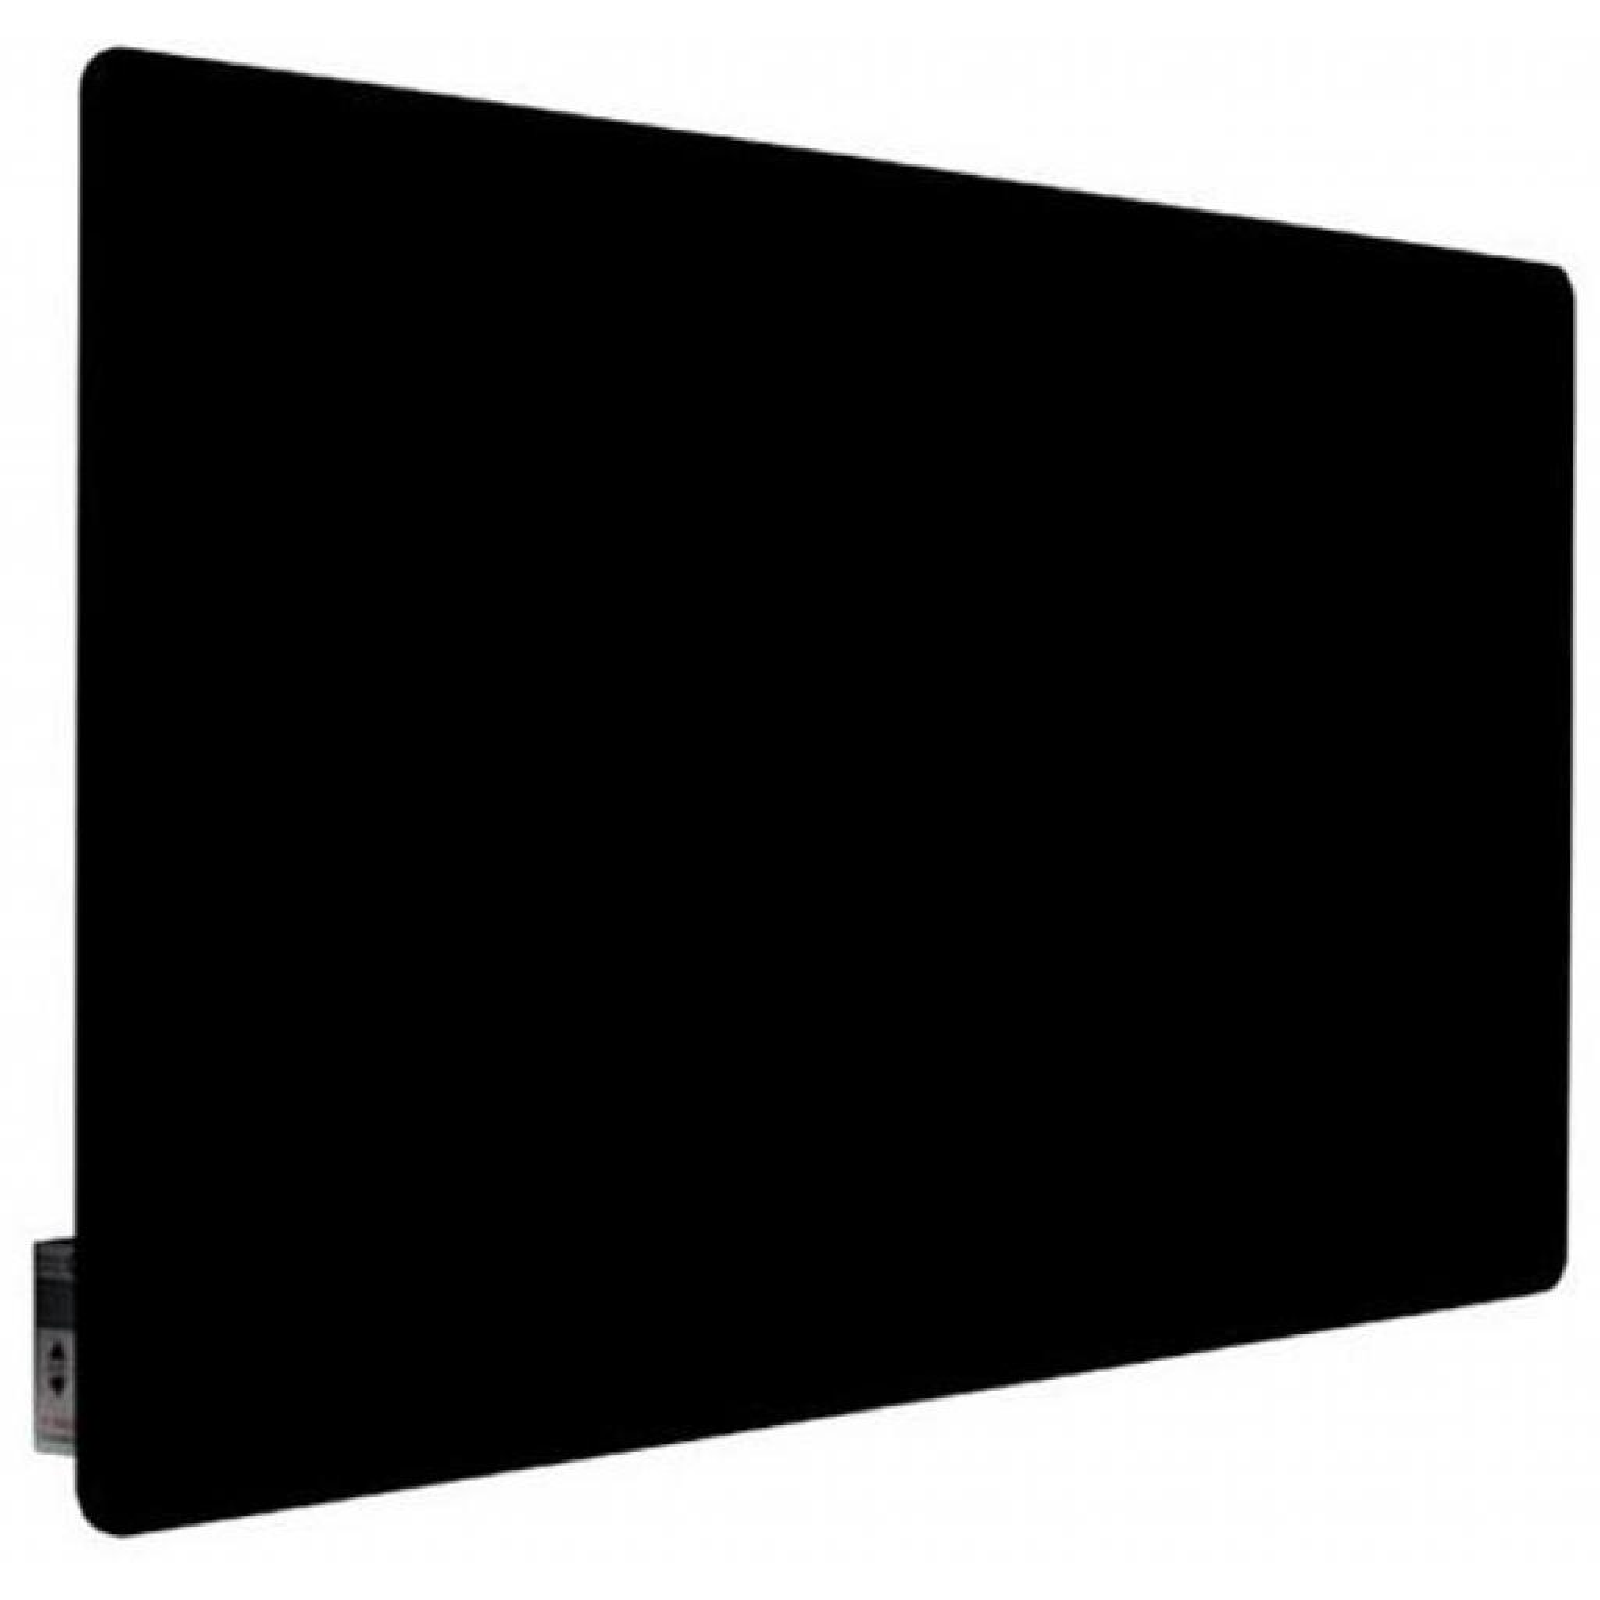 Обогреватель SunWay SWG-RA450 BLACK (SWG-RA450-BLACK)